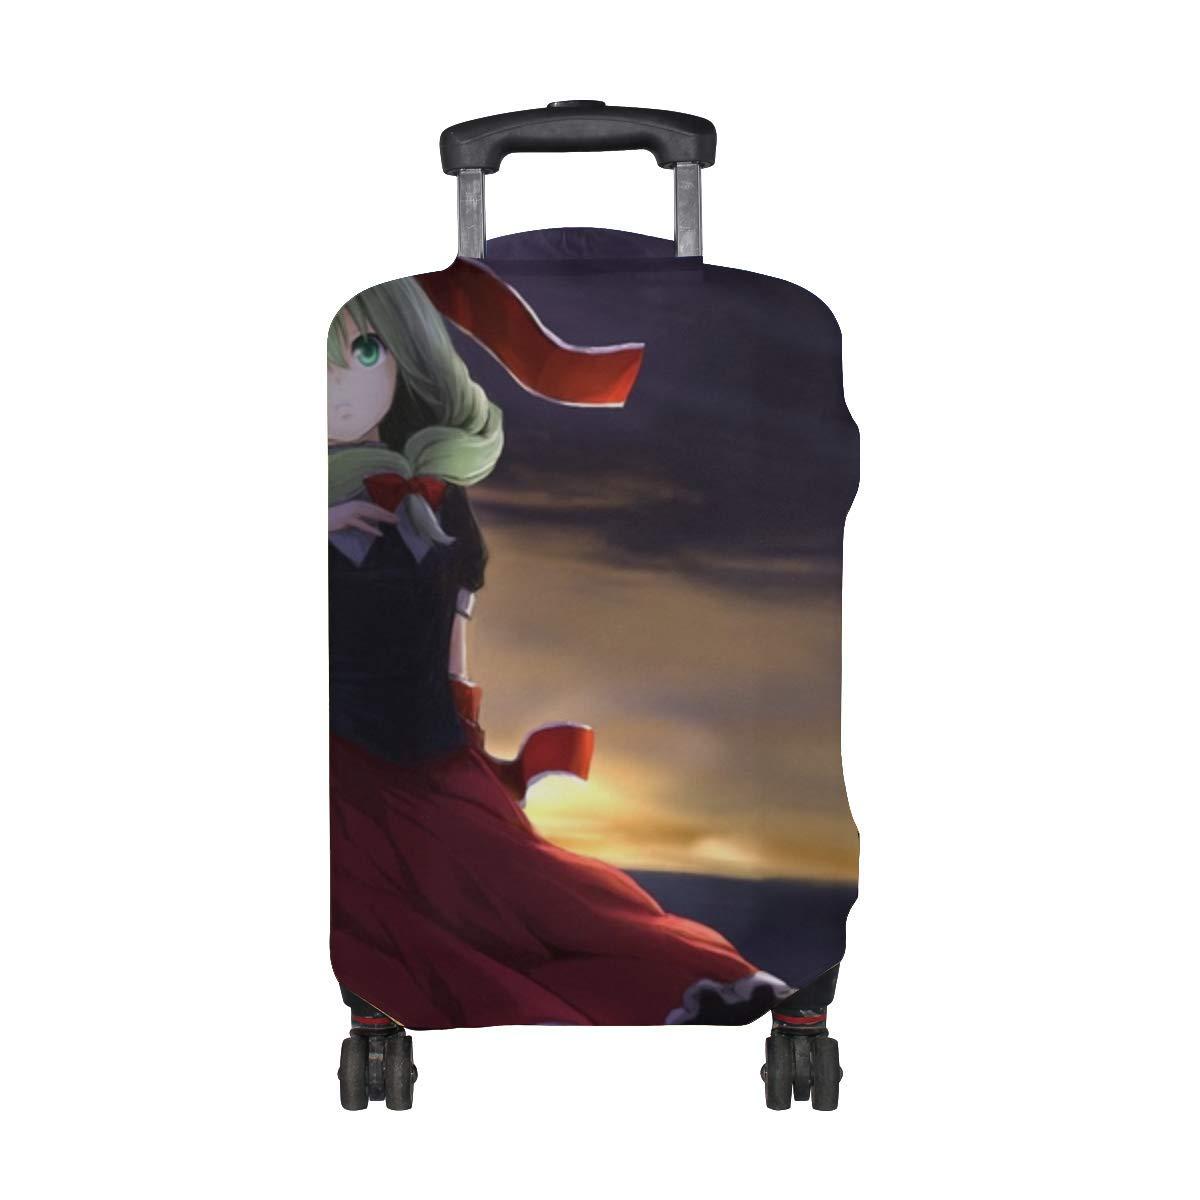 Maxm Touhou Kagiyama Hina Girl Anime Dress Pattern Print Travel Luggage Protector Baggage Suitcase Cover Fits 18-21 Inch Luggage